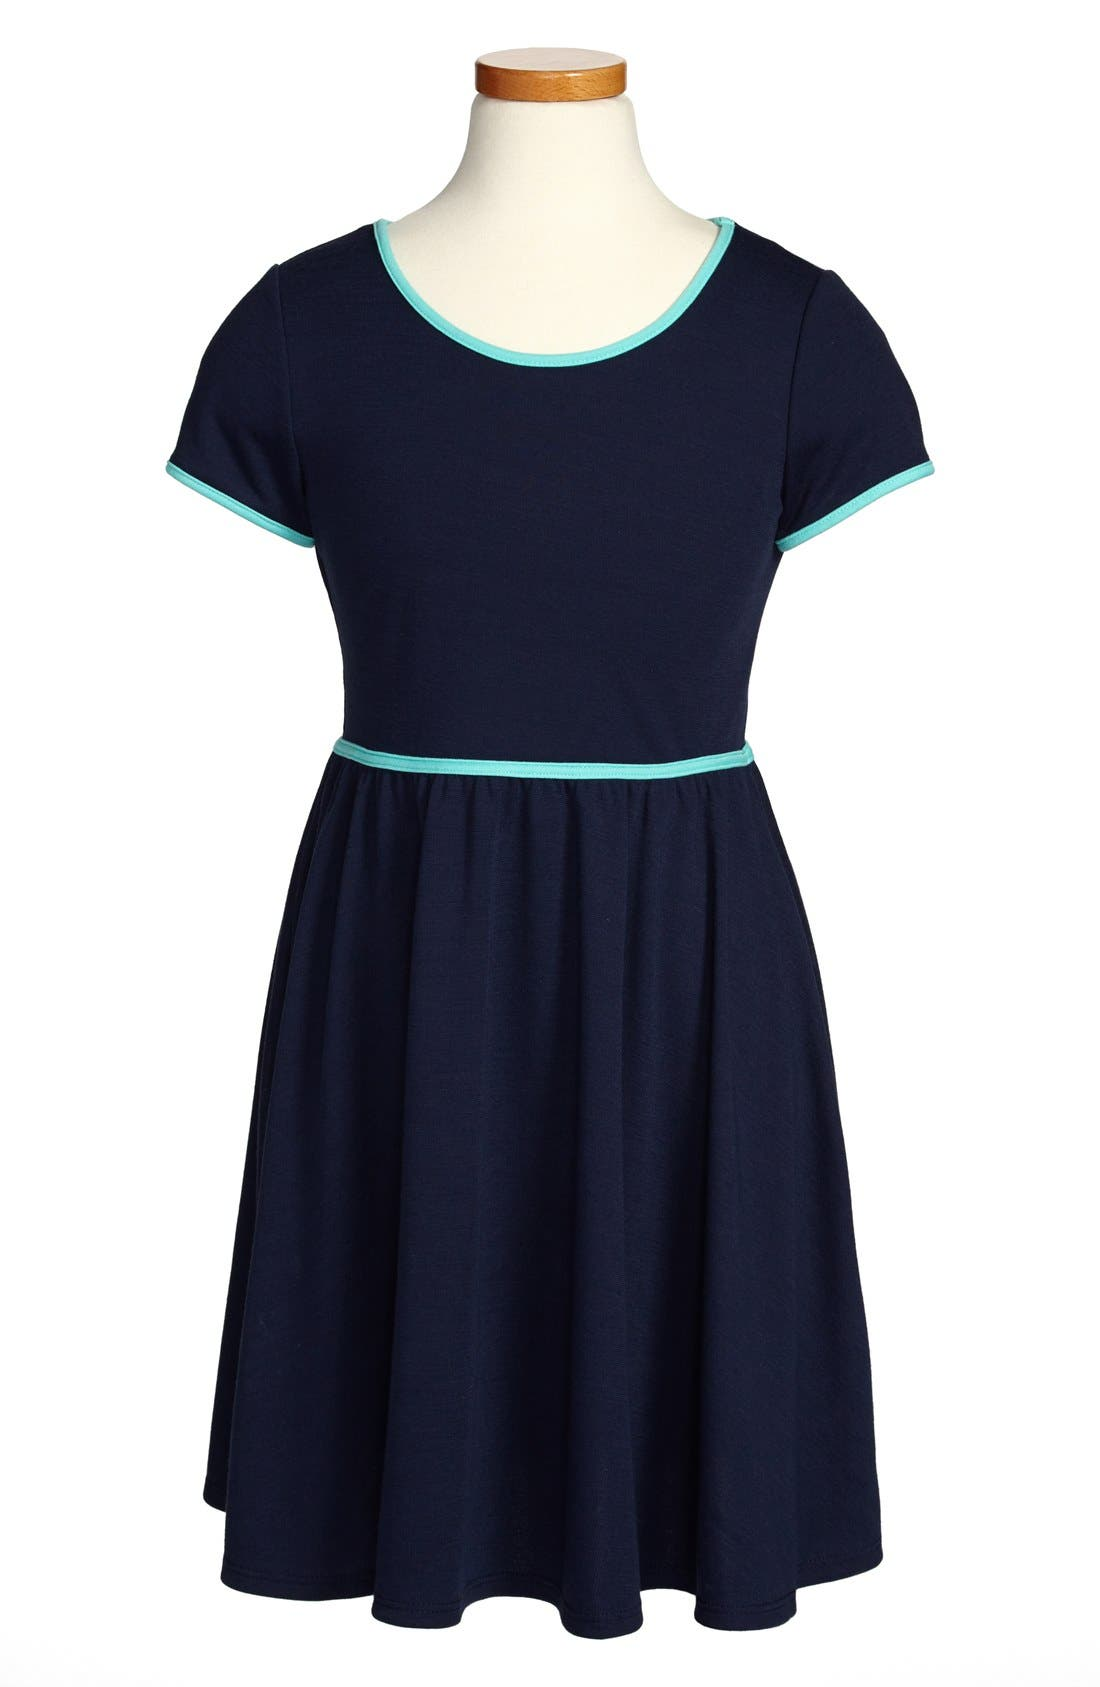 Alternate Image 1 Selected - Soprano Cap Sleeve Knit Dress (Big Girls)